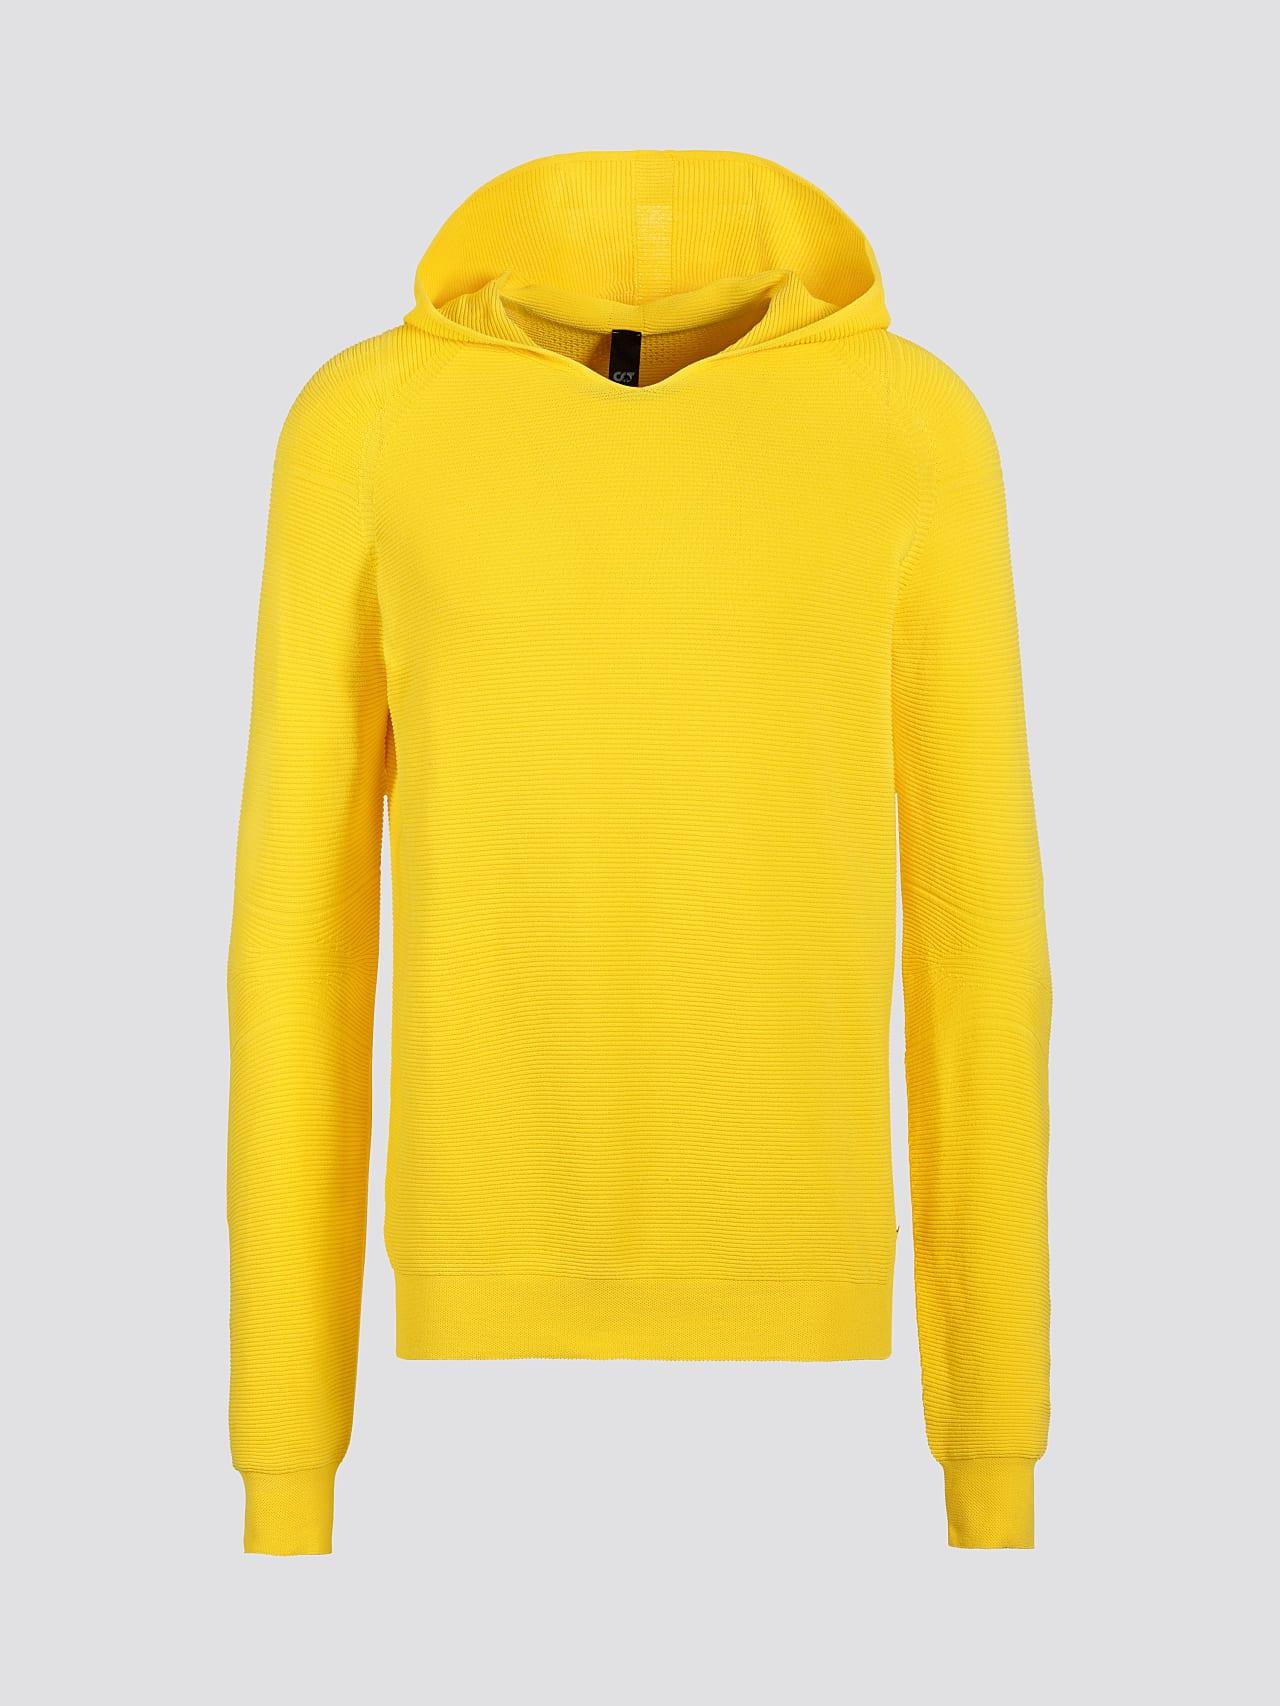 FURAP V3.Y5.01 Seamless Knit Hoodie yellow Back Alpha Tauri